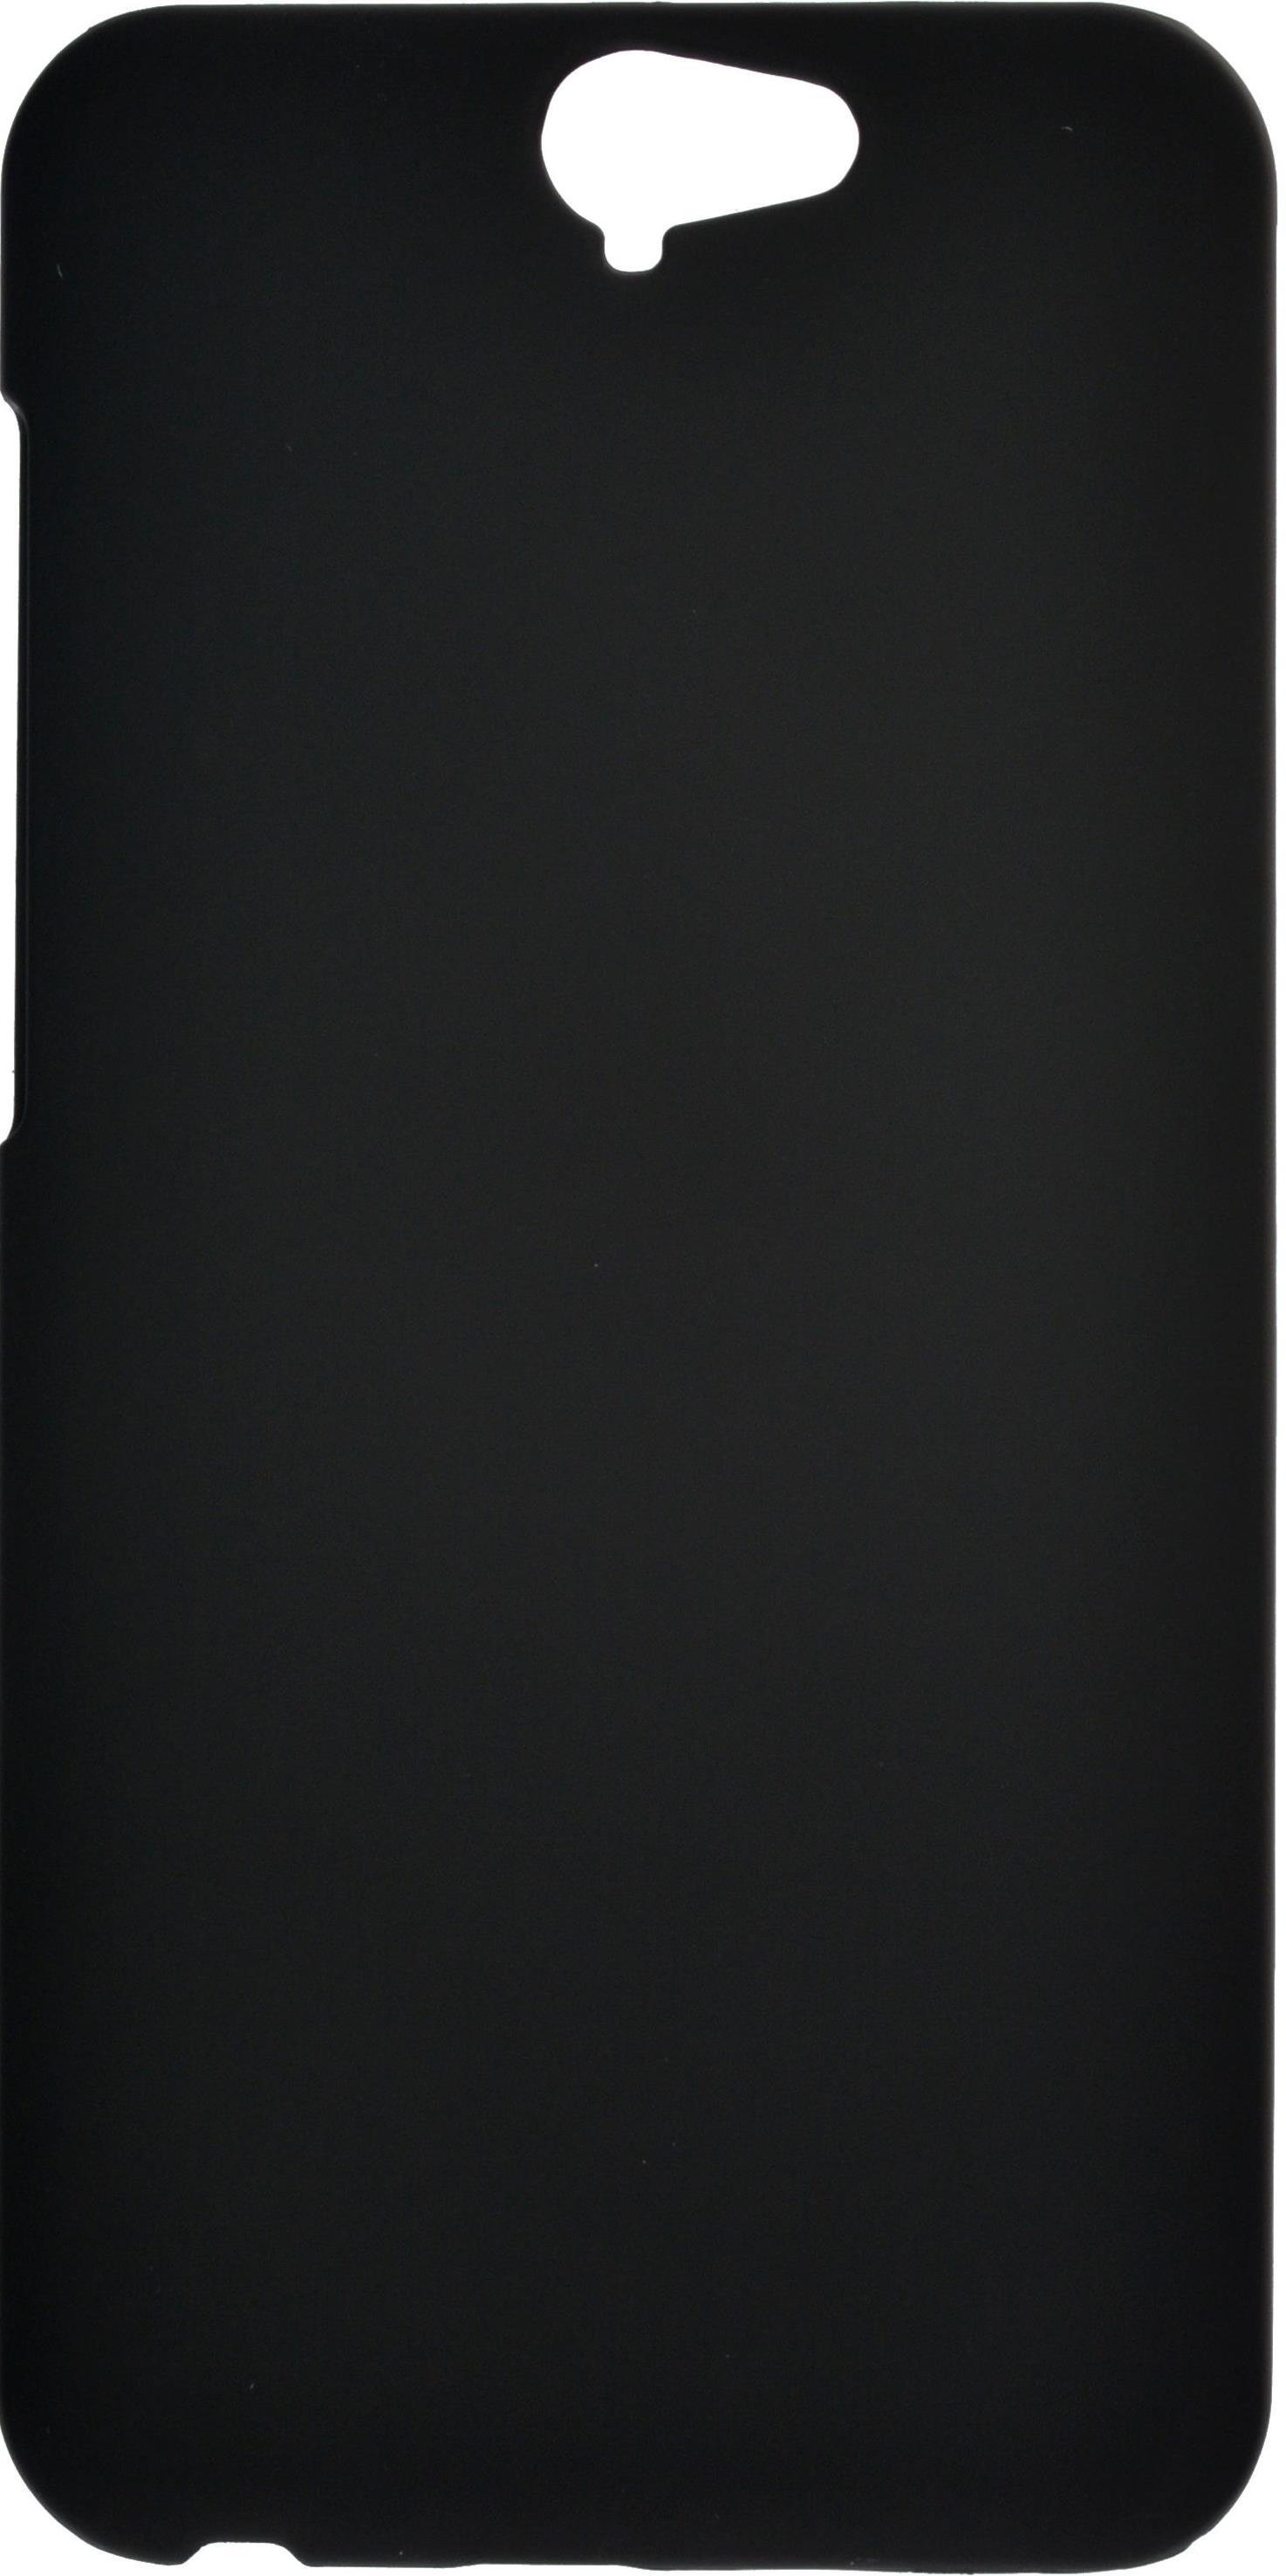 Накладка skinBOX для HTC One A9 черный, 2000000084312, черный аккумулятор для телефона craftmann b0p6m100 для htc one mini 2 m5 one m8 mini one remix